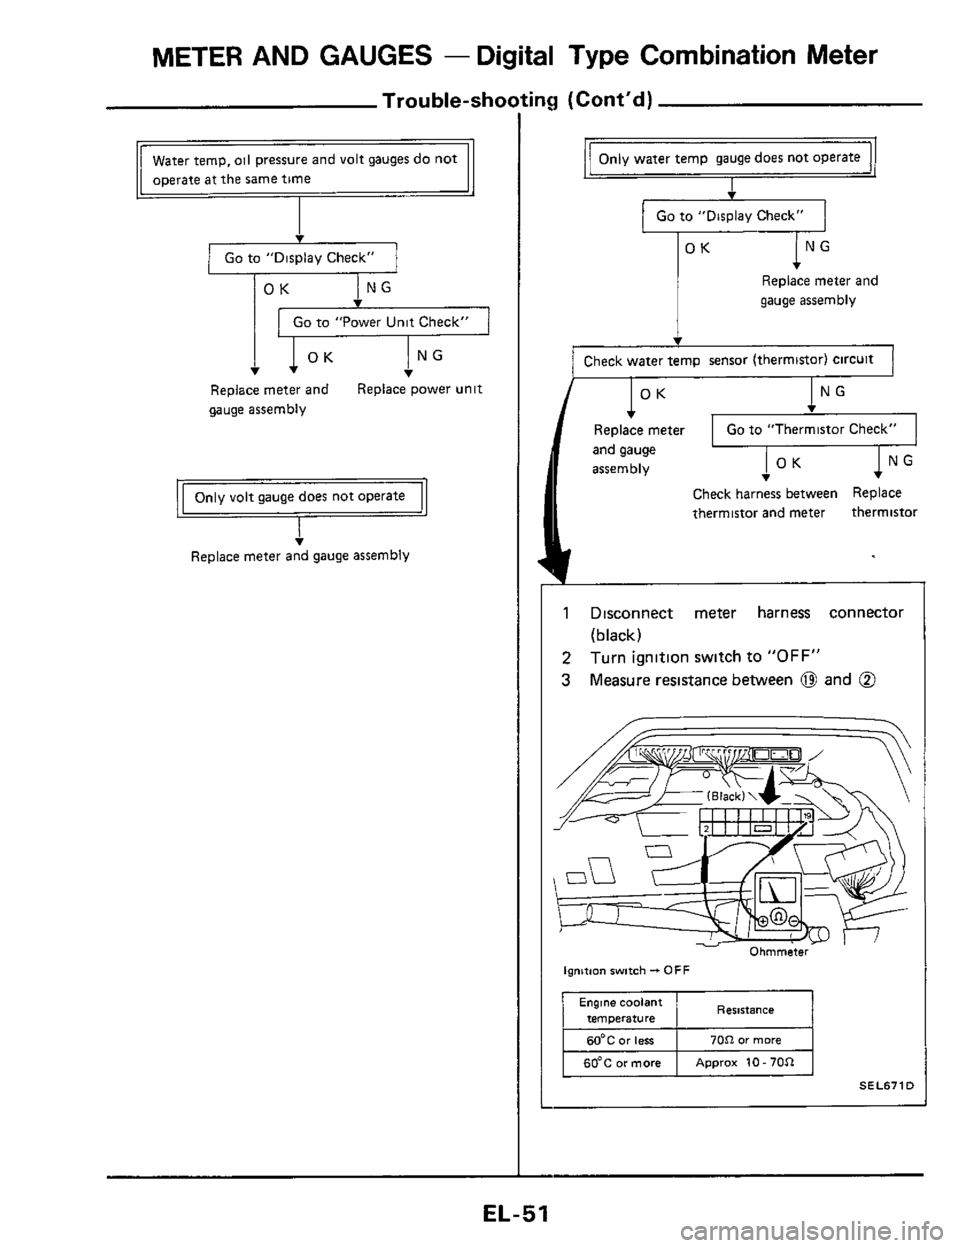 Nissan 300zx 1984 Z31 Electrical System Workshop Manual Wiring Diagram